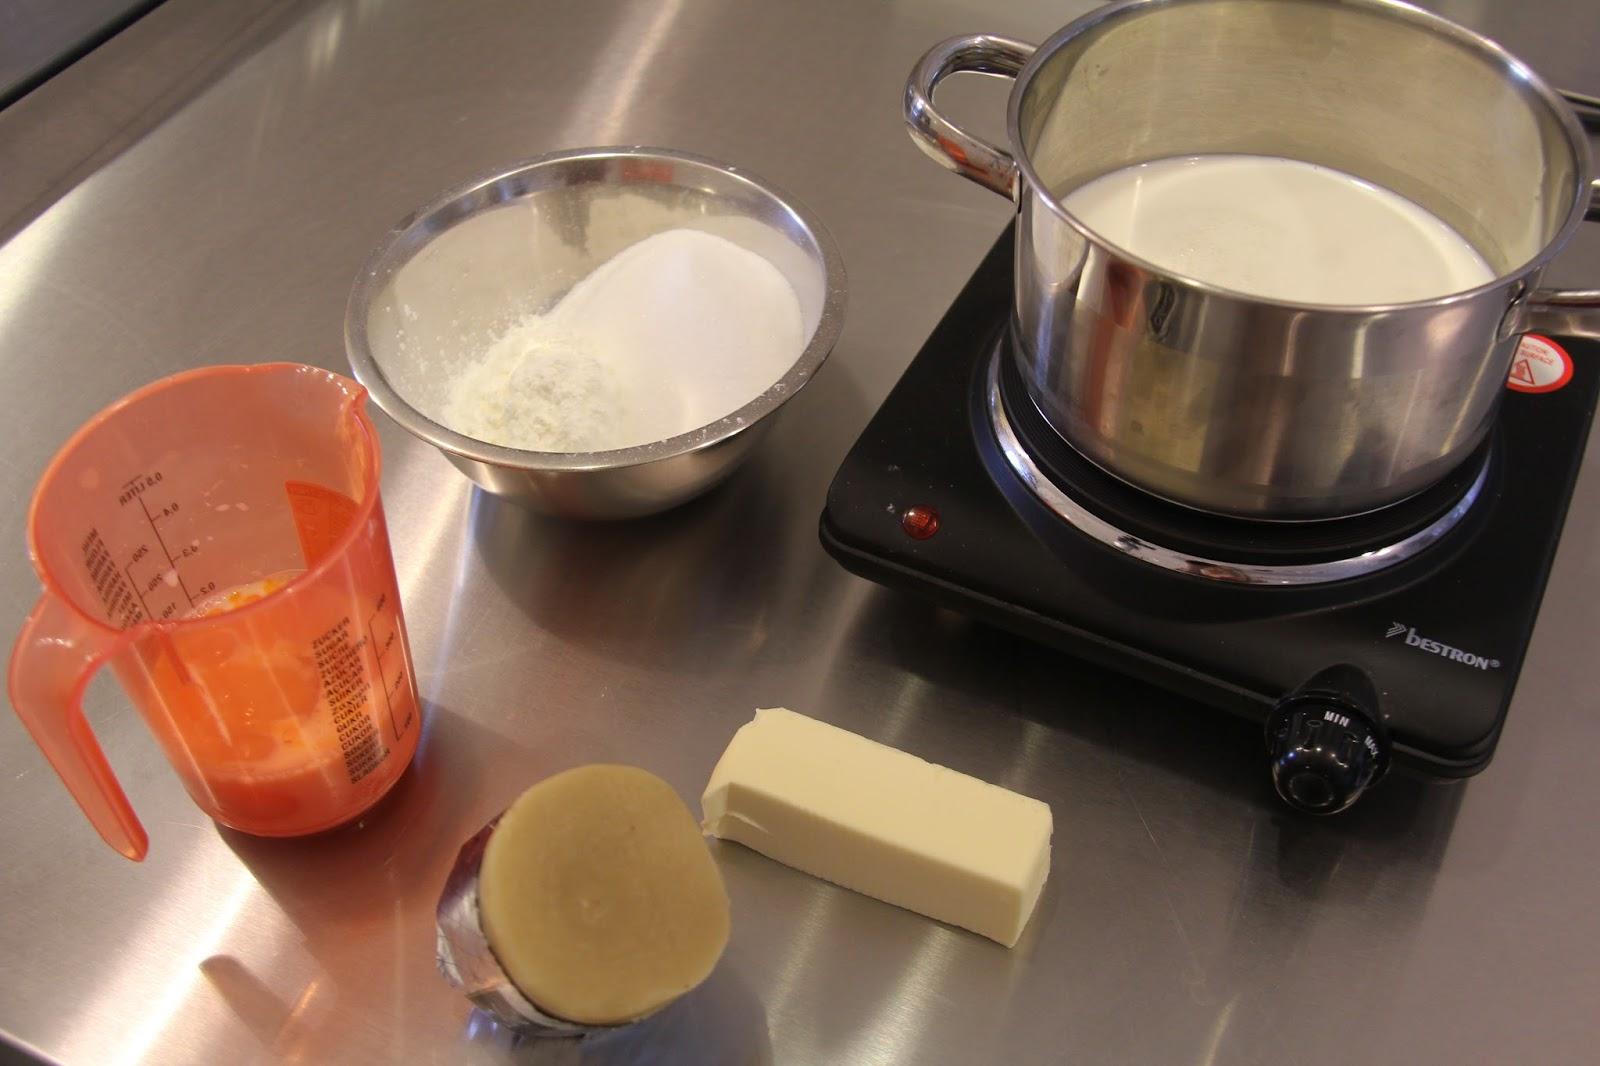 Kuchenfee Lisa Biskuit ~ kuchenfee lisa marzipan creme